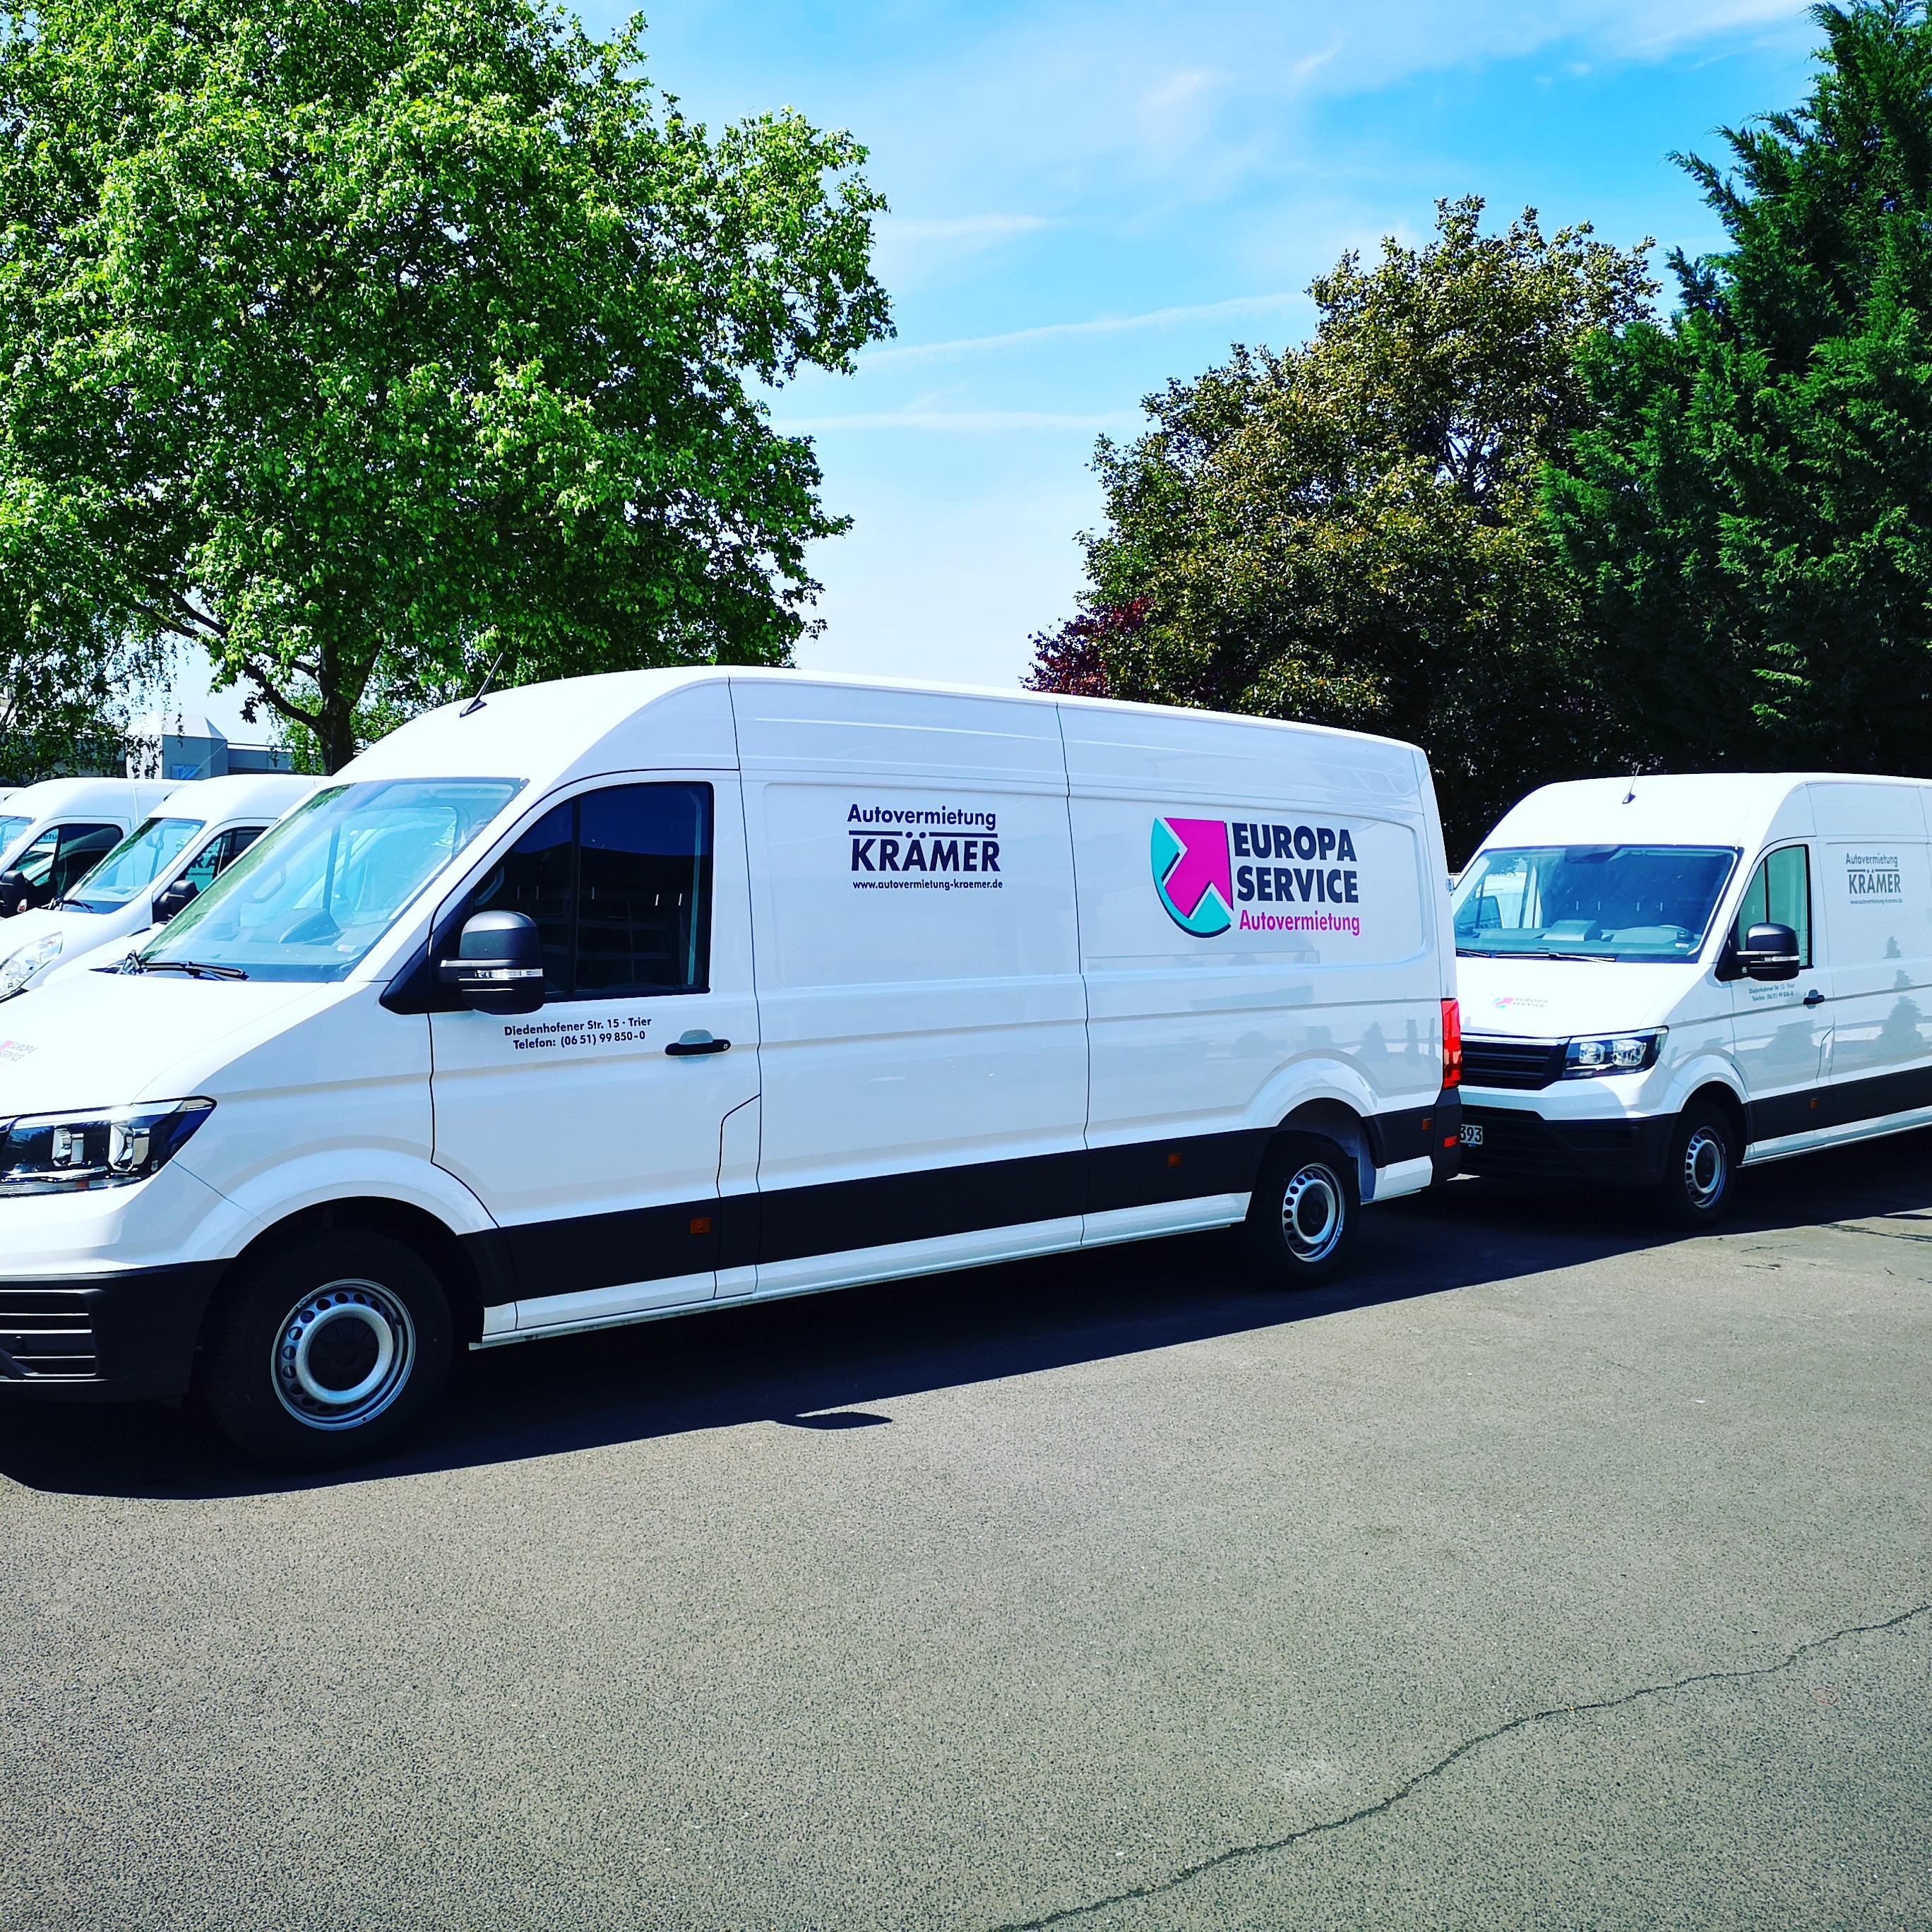 Autovermietung Krämer Trier(Europa Service)